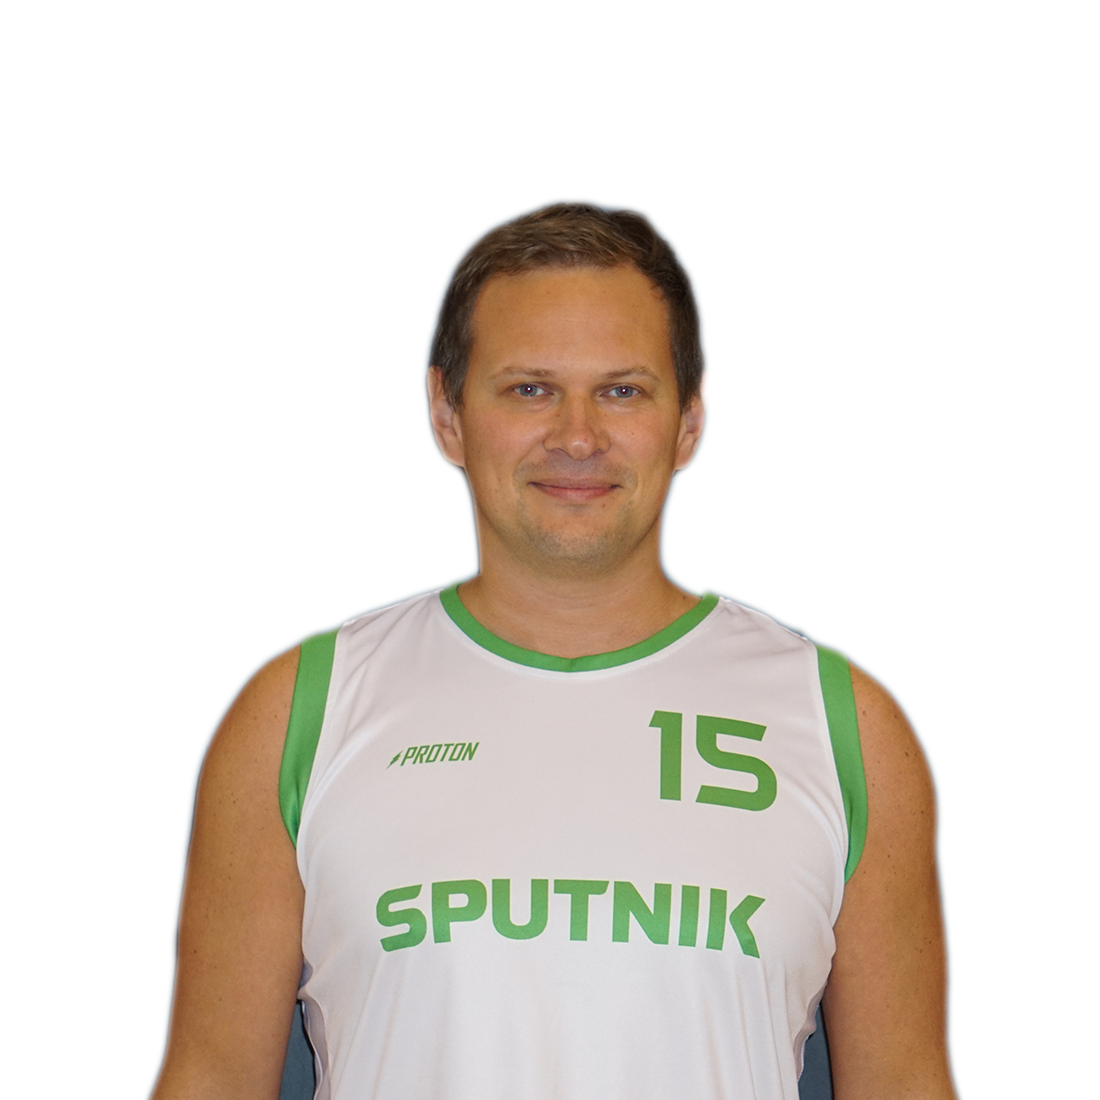 Tomasz Gerke